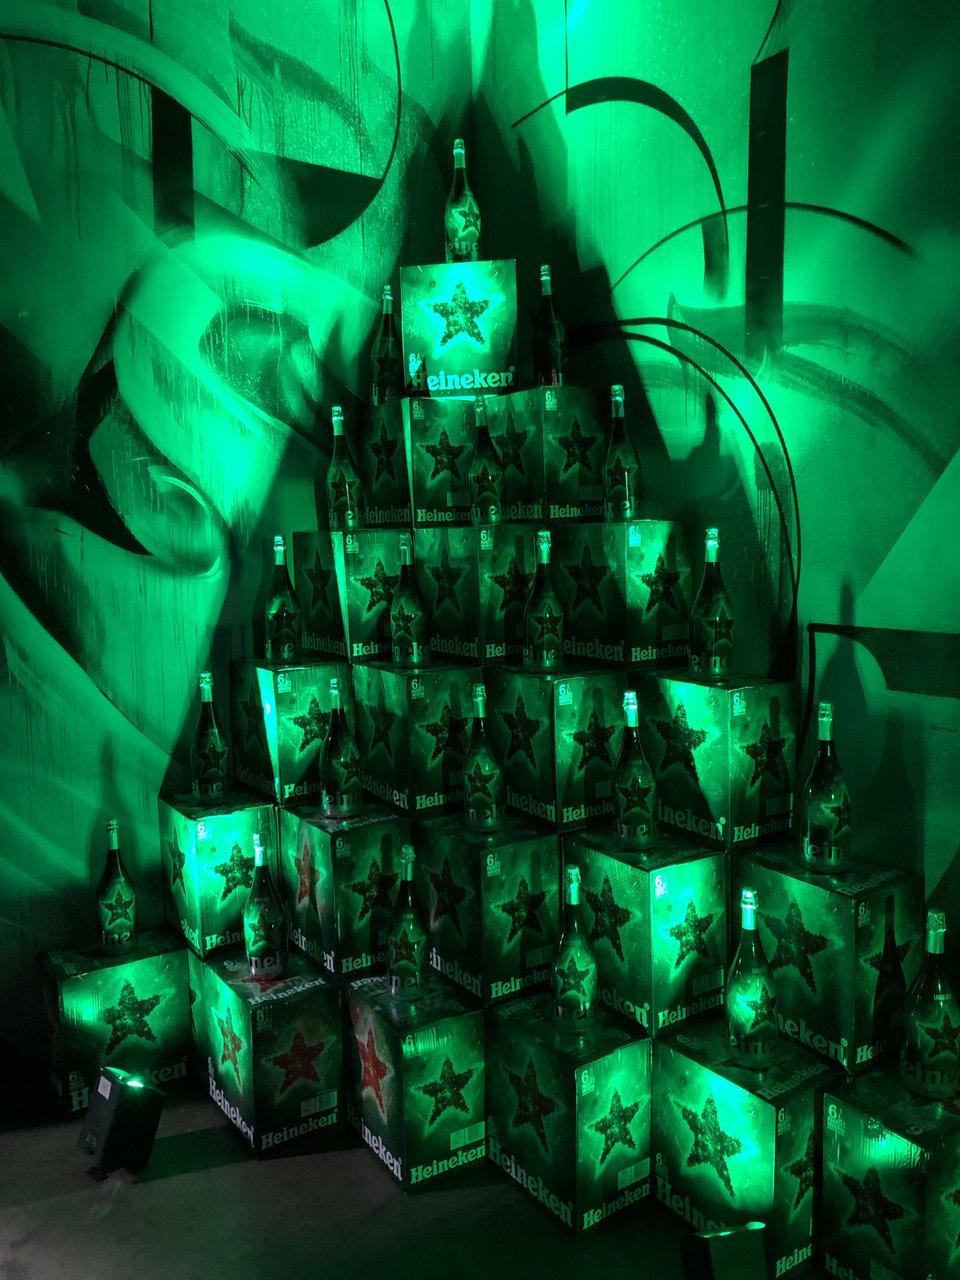 THE PARTY, by Heineken photo 1556490548412_IMG_9904.jpg